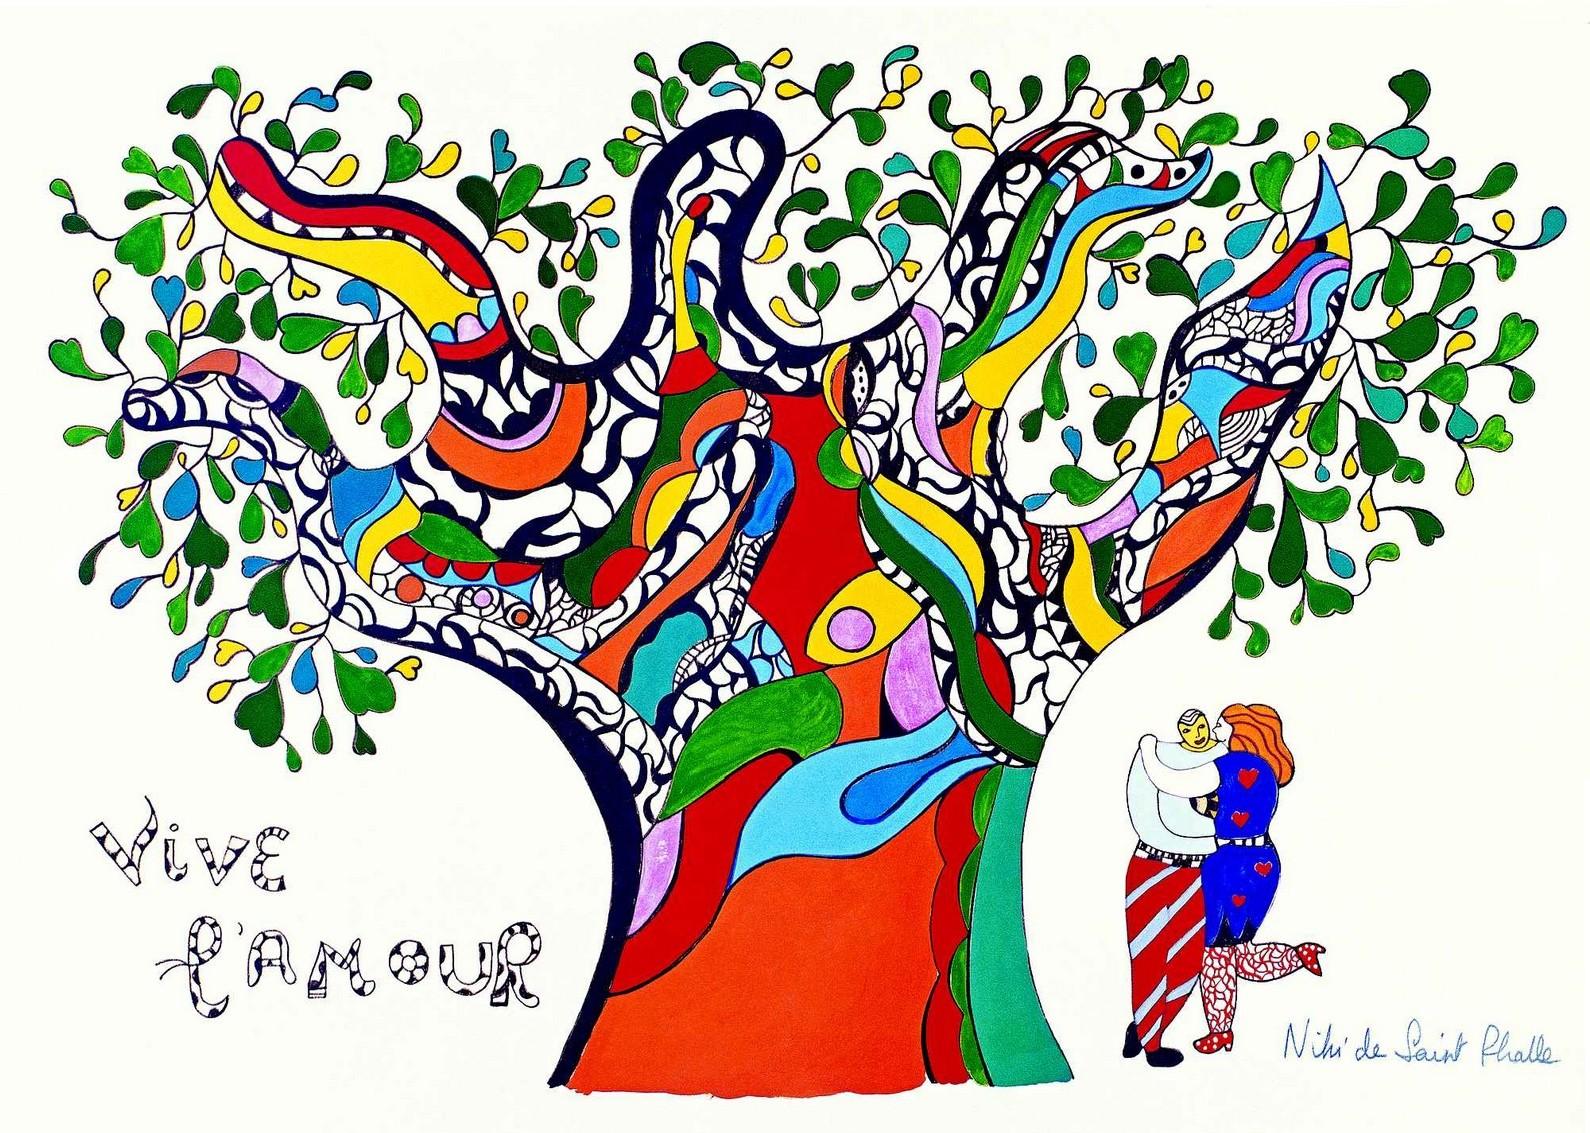 niki saint phalle-vive l amour